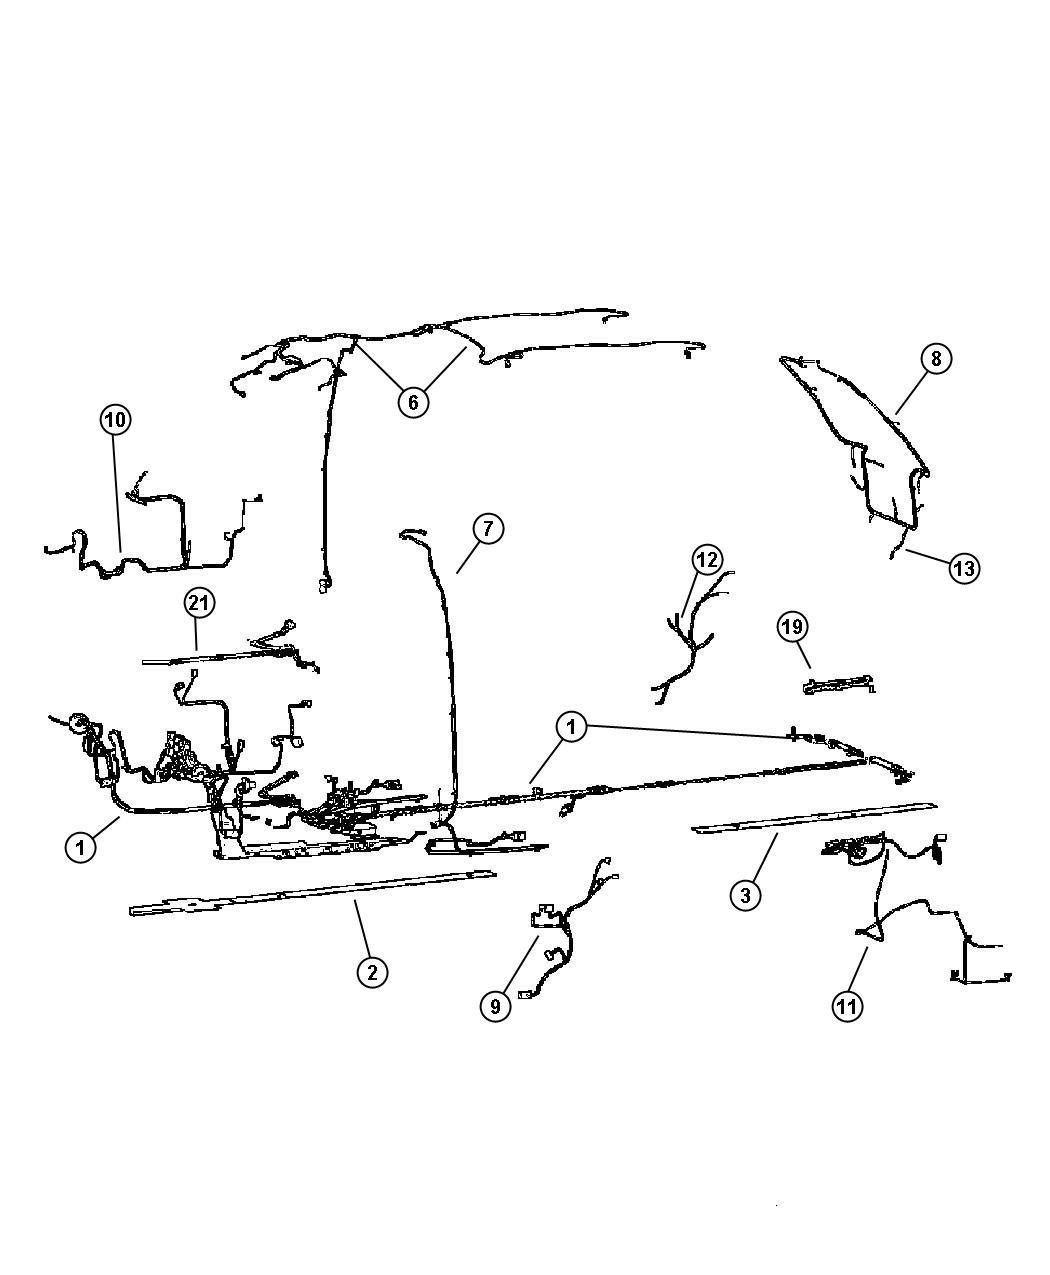 2002 chrysler town country wire track sliding door. Black Bedroom Furniture Sets. Home Design Ideas